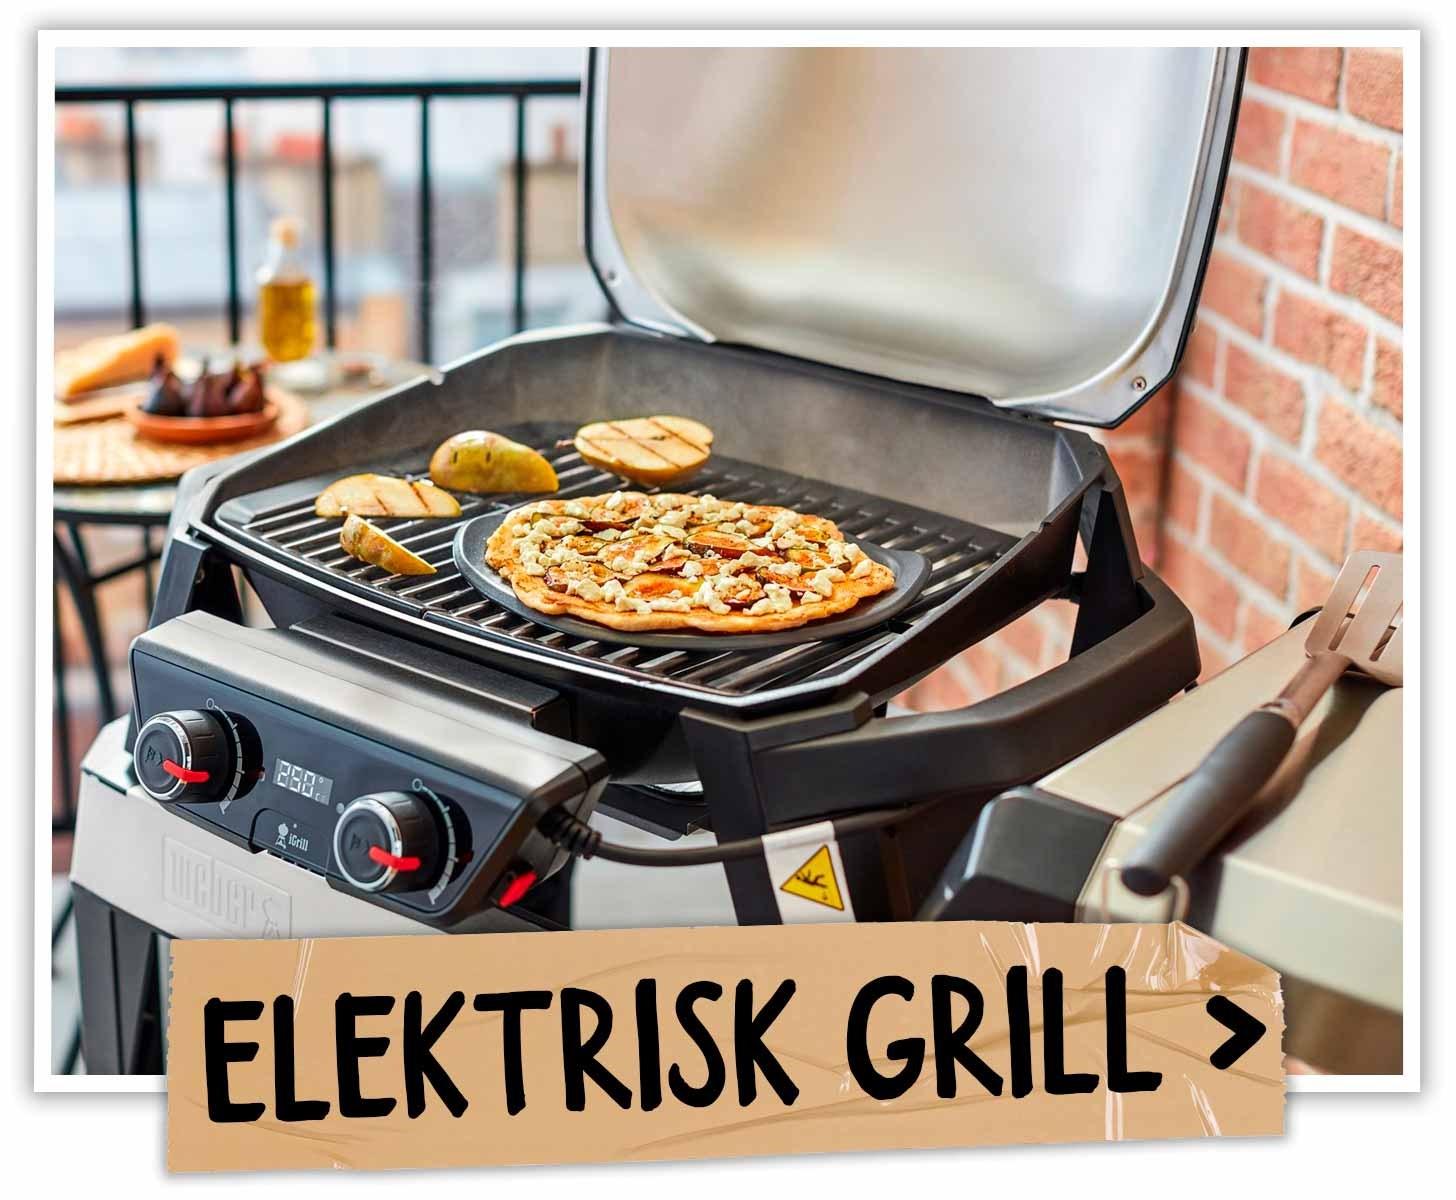 Grillskole - Elektrisk grill